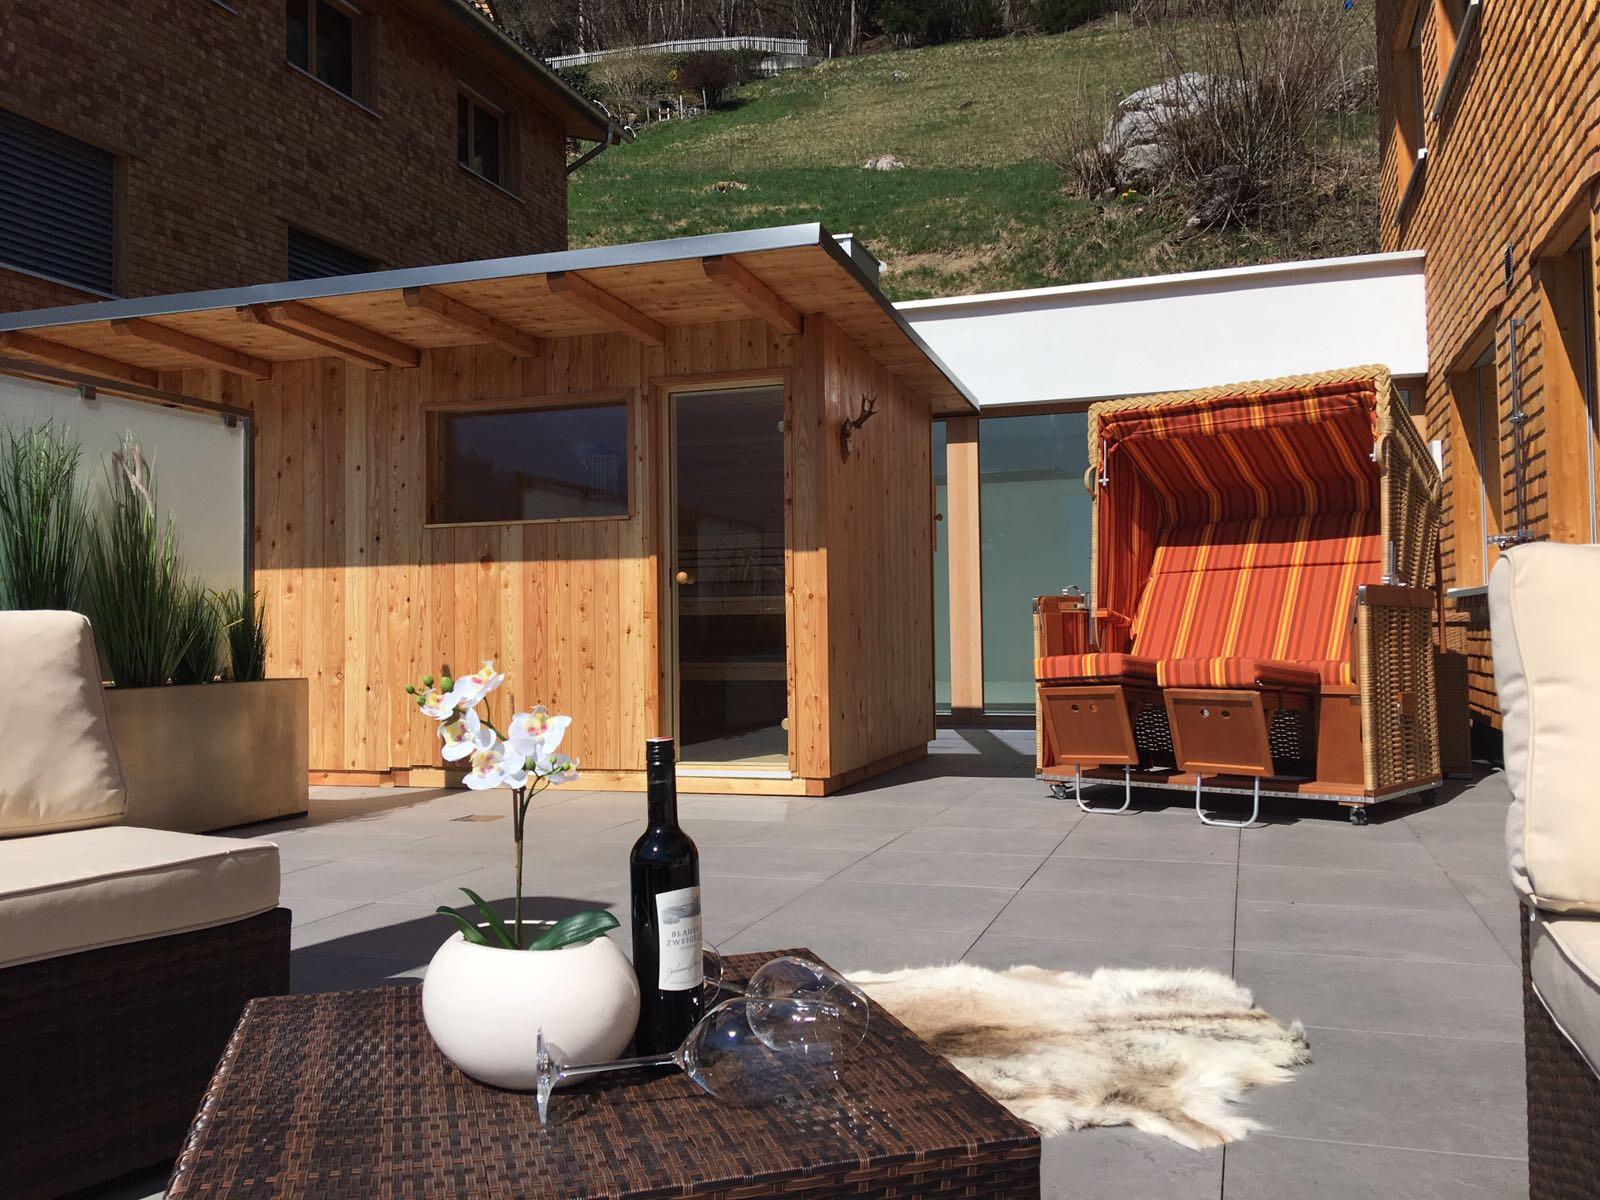 Appartement Zimbablick, Montafon, Vorarlberg - Terasse mit Panoramasauna